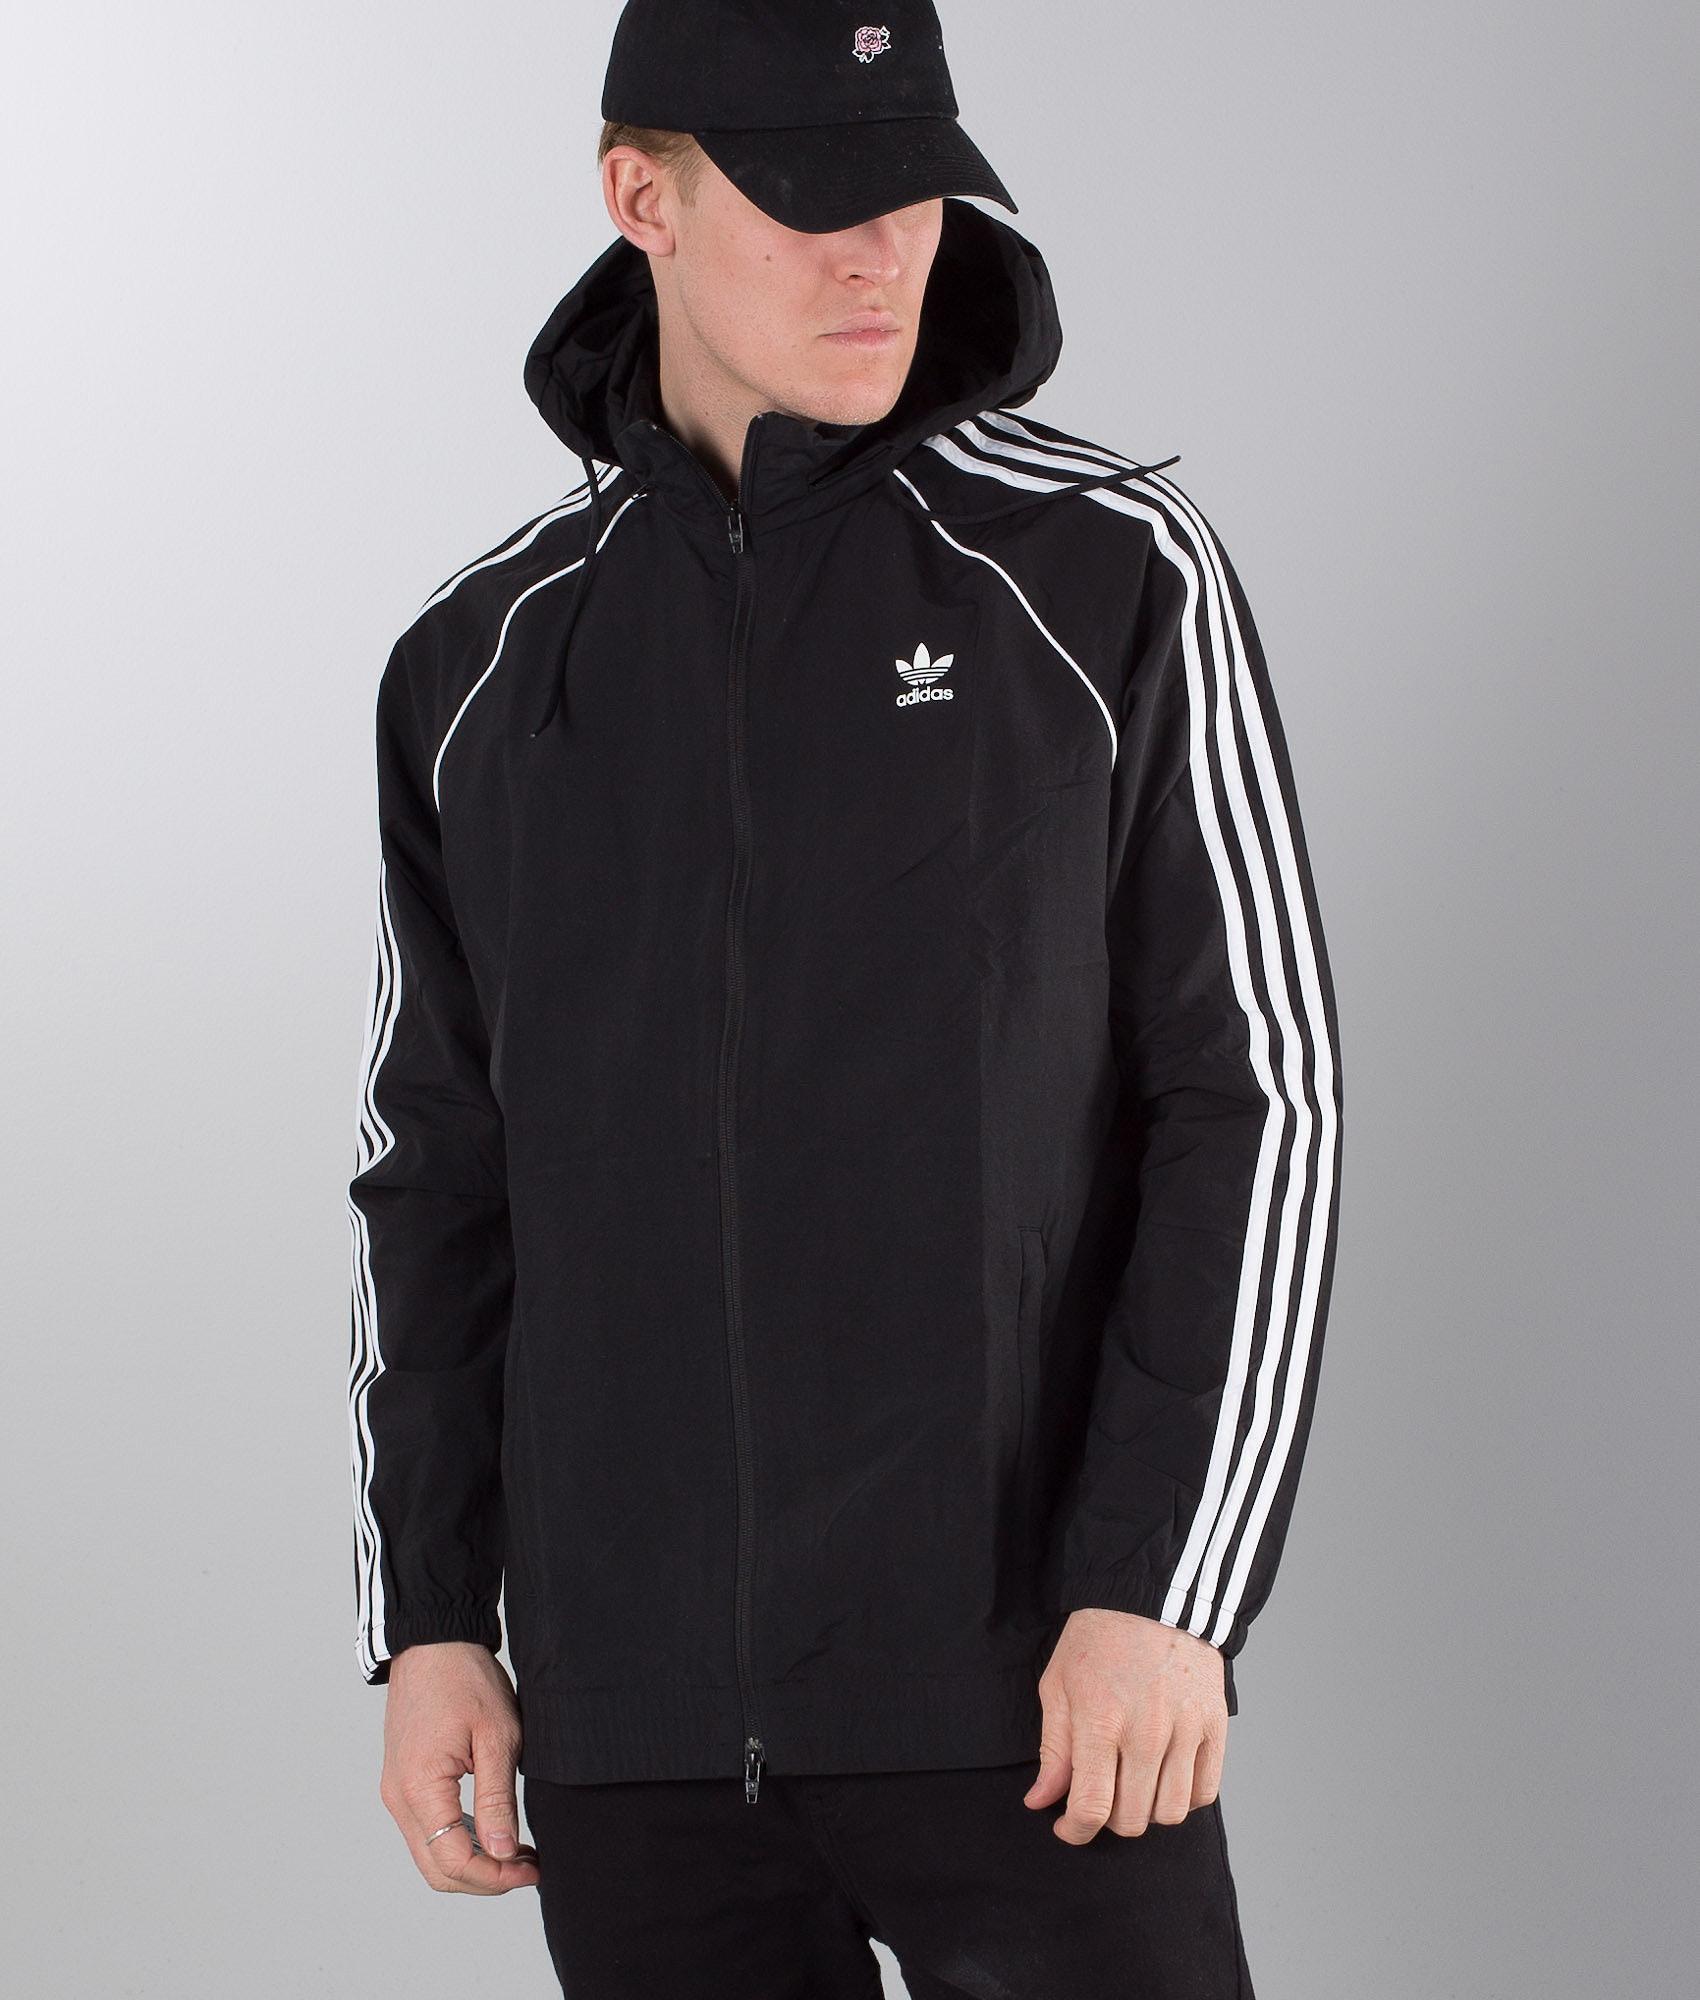 5d86962af Adidas Originals SST Jacket Black - Ridestore.com